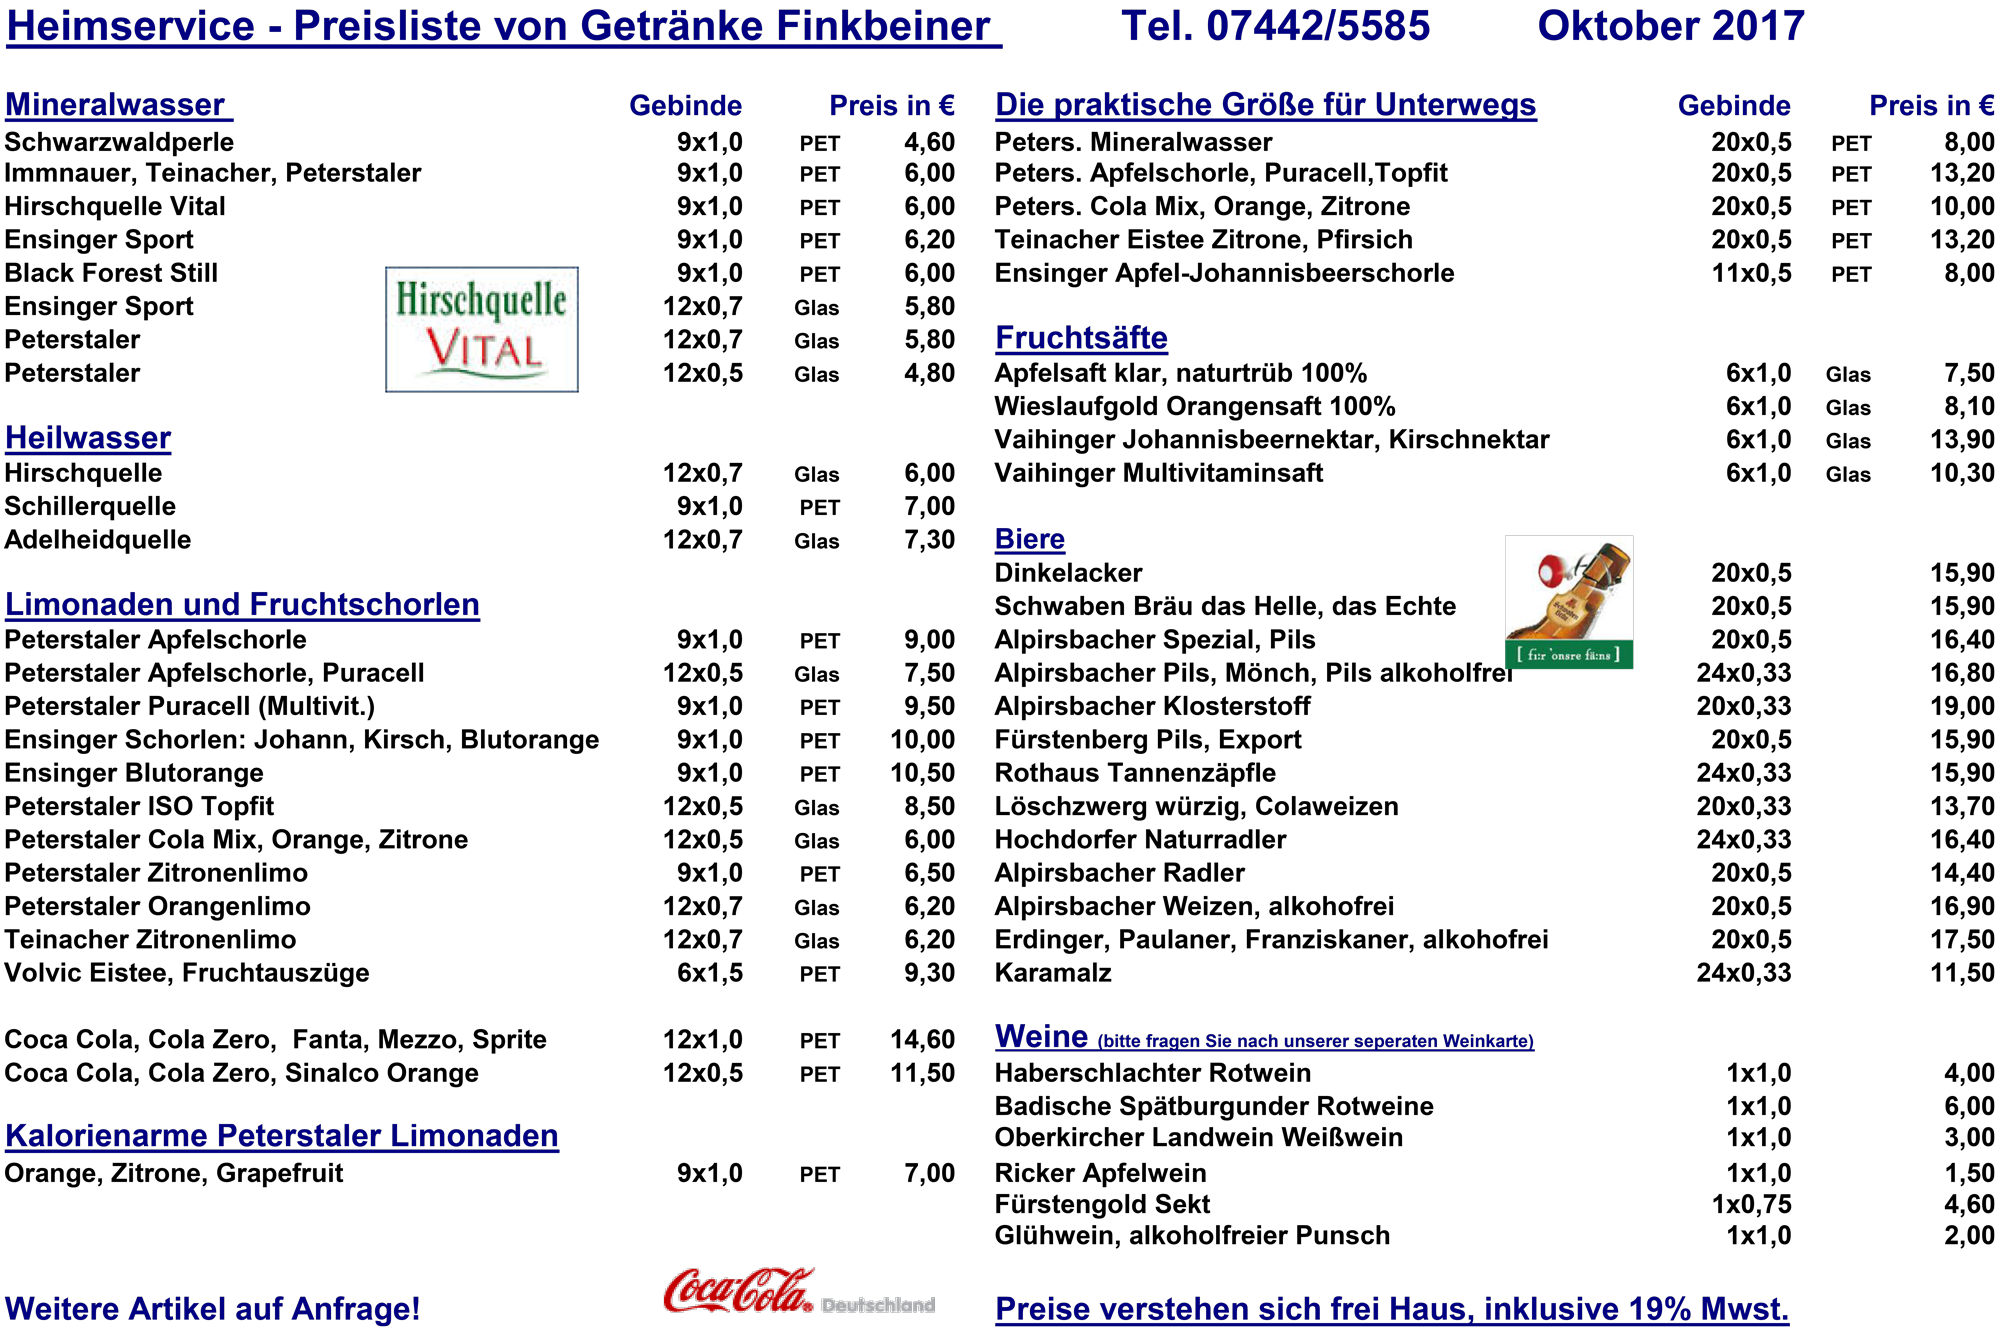 Getränke Finkbeiner, Baiersbronn: Getränkelieferservice im Kreis FDS